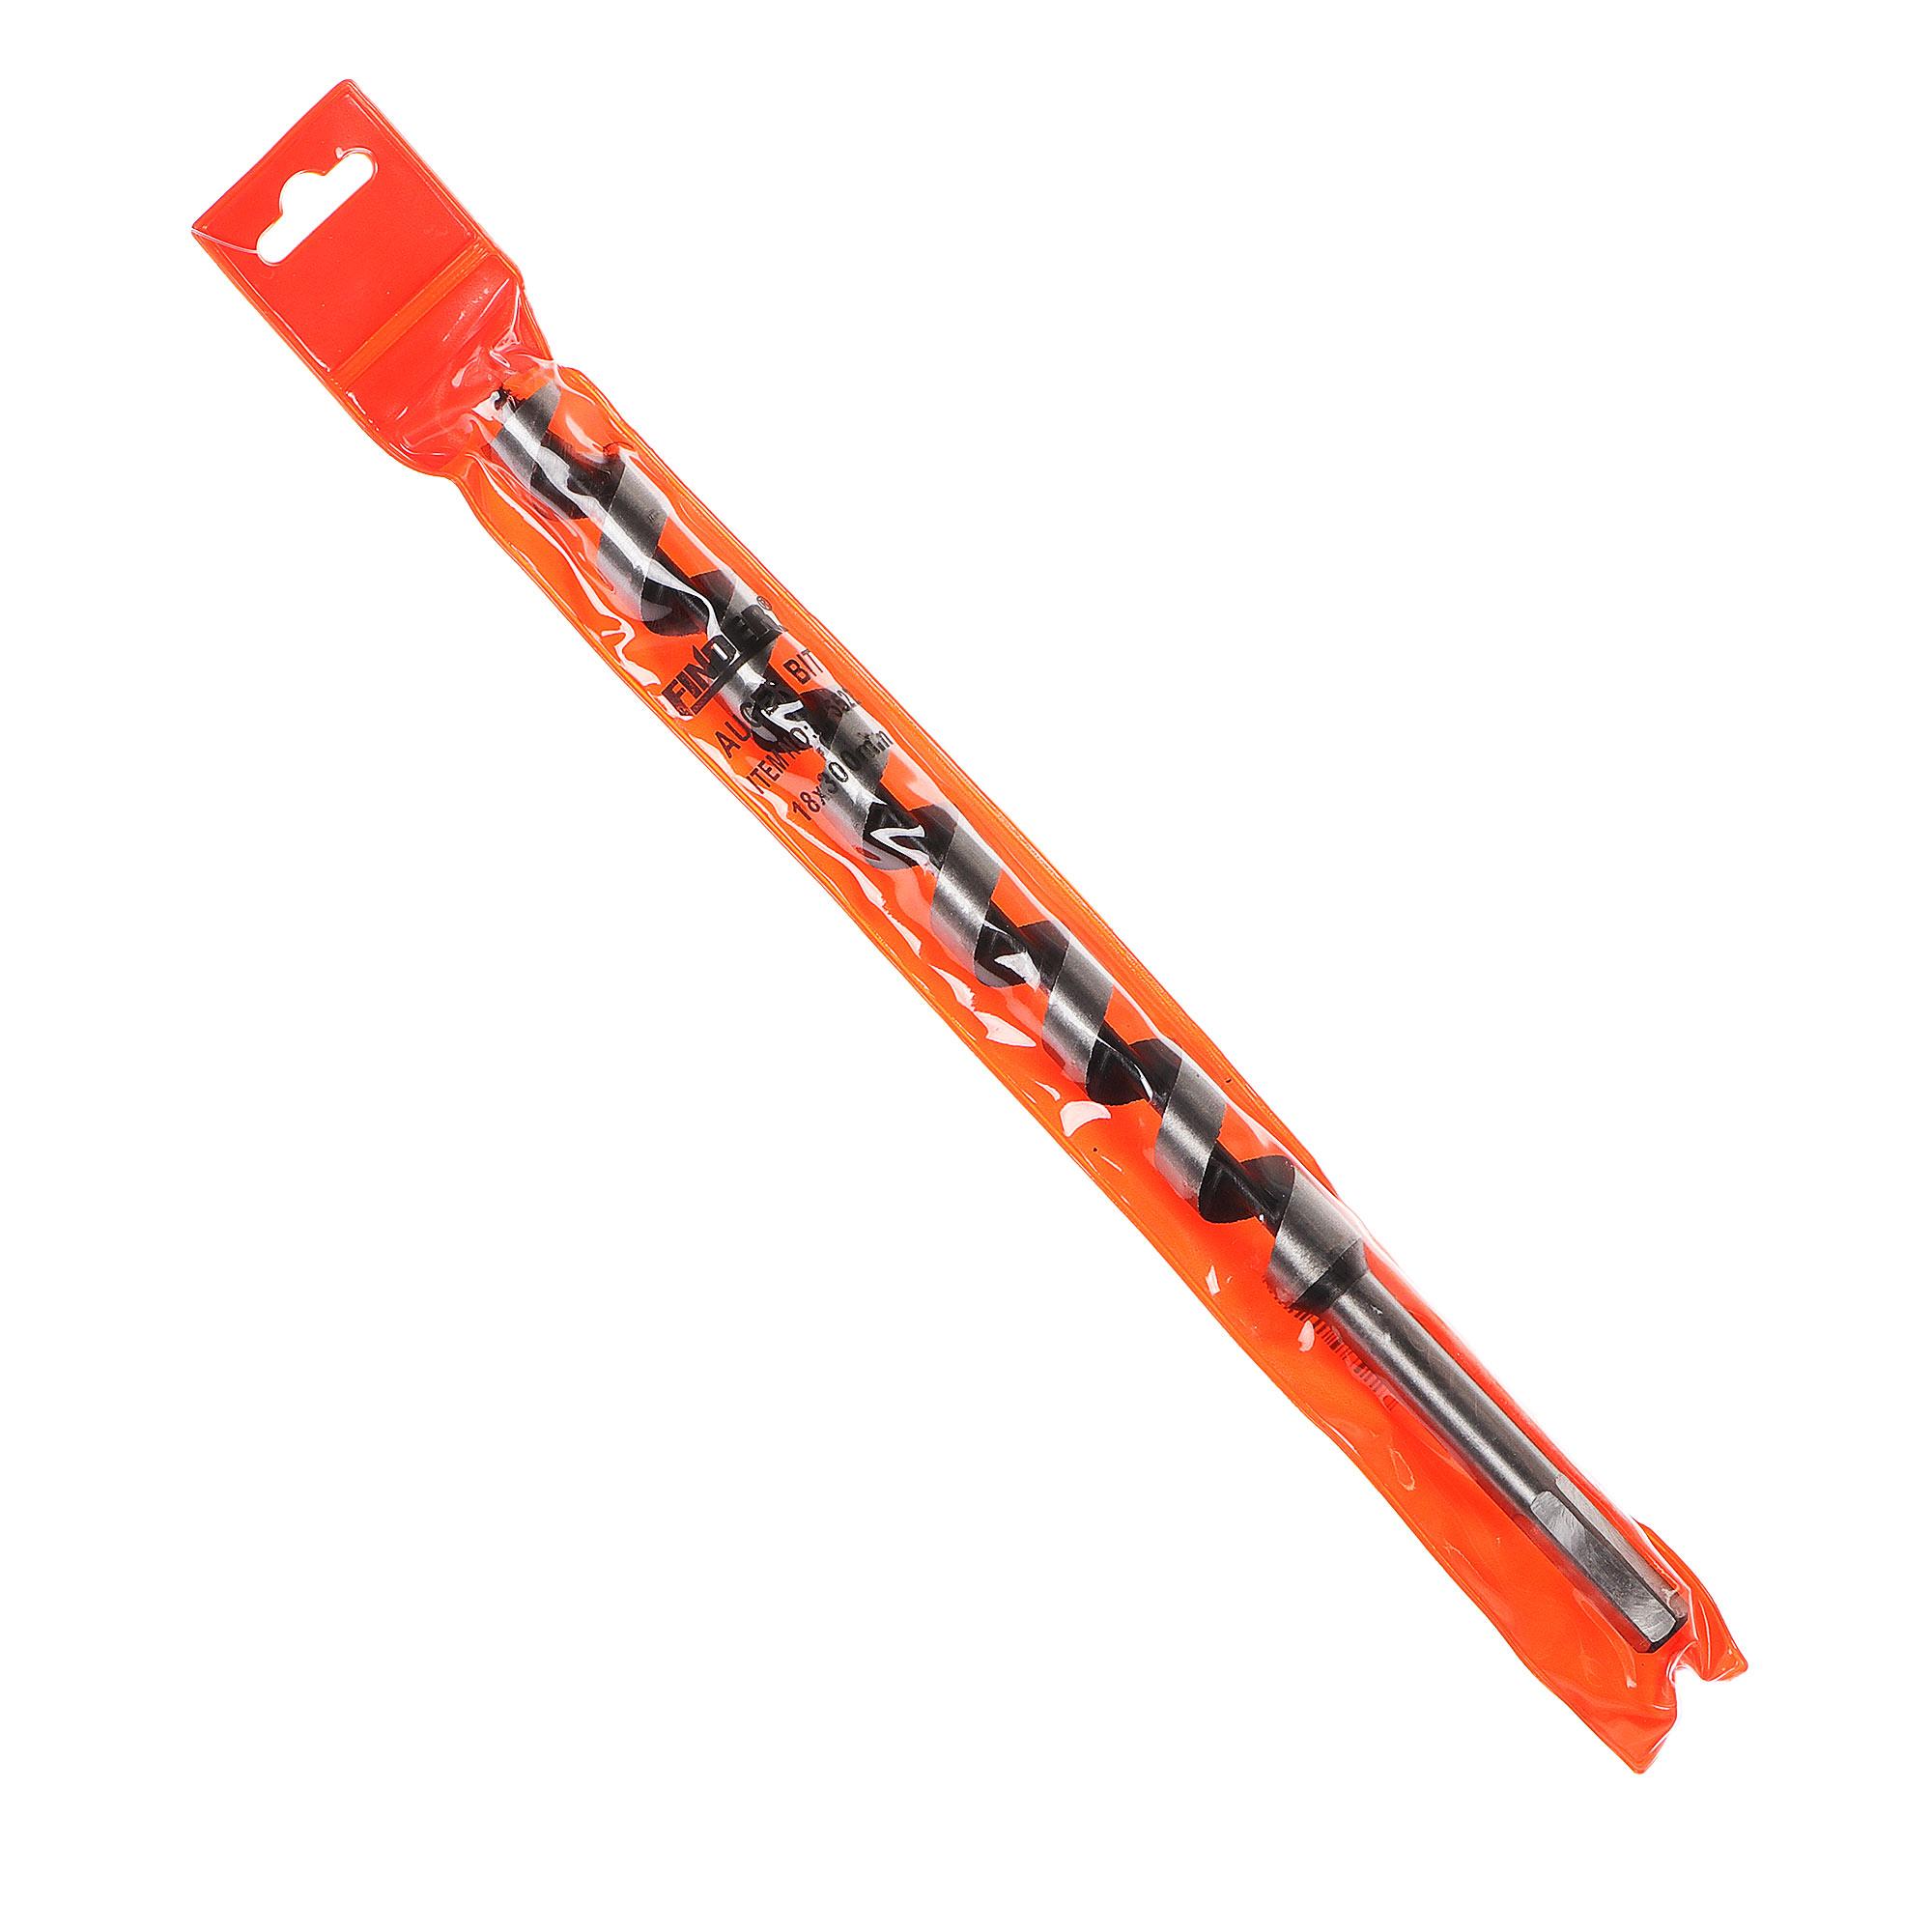 Сверло спиральное Finder 18х300 см сверло спиральное finder 18х300 см